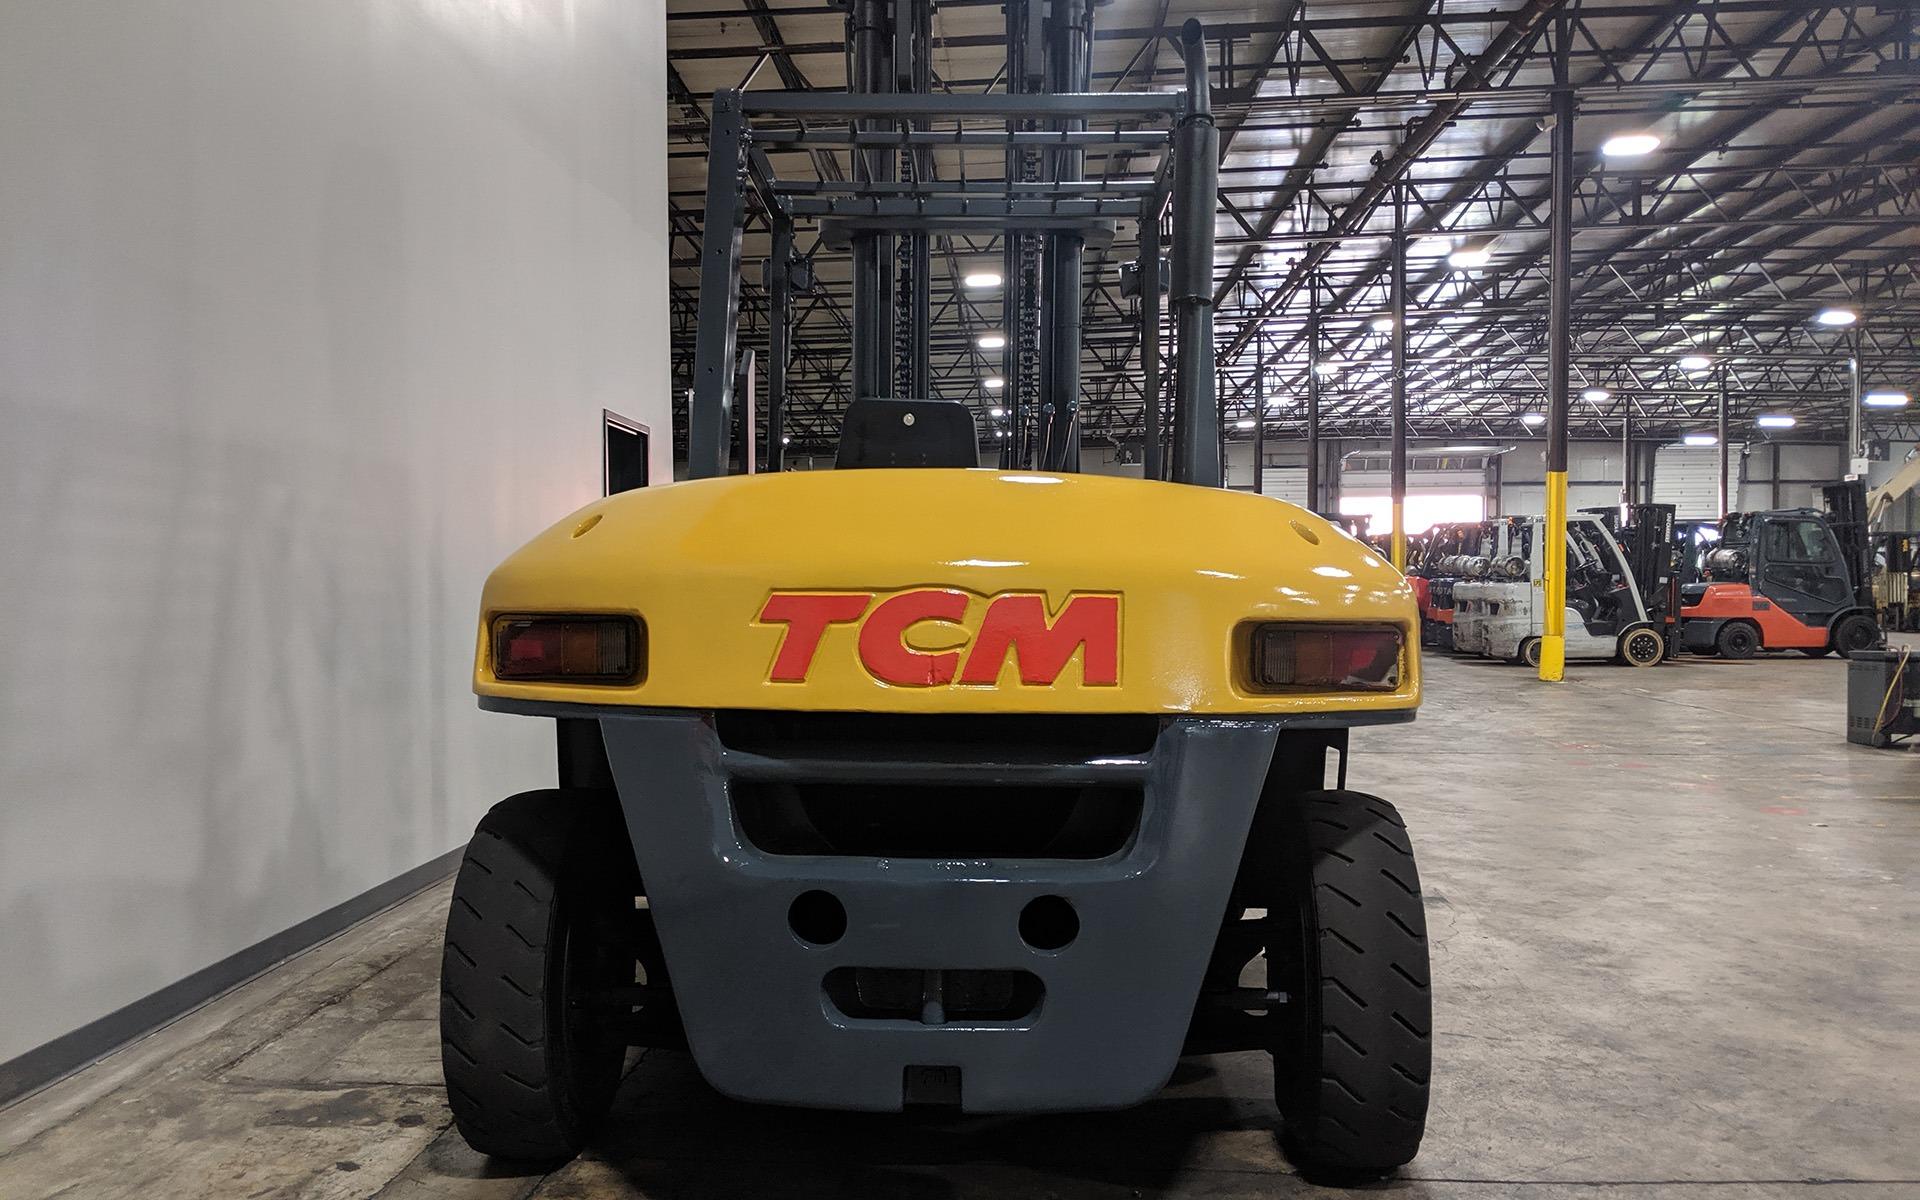 Used 2006 TCM FD70-9  | Cary, IL